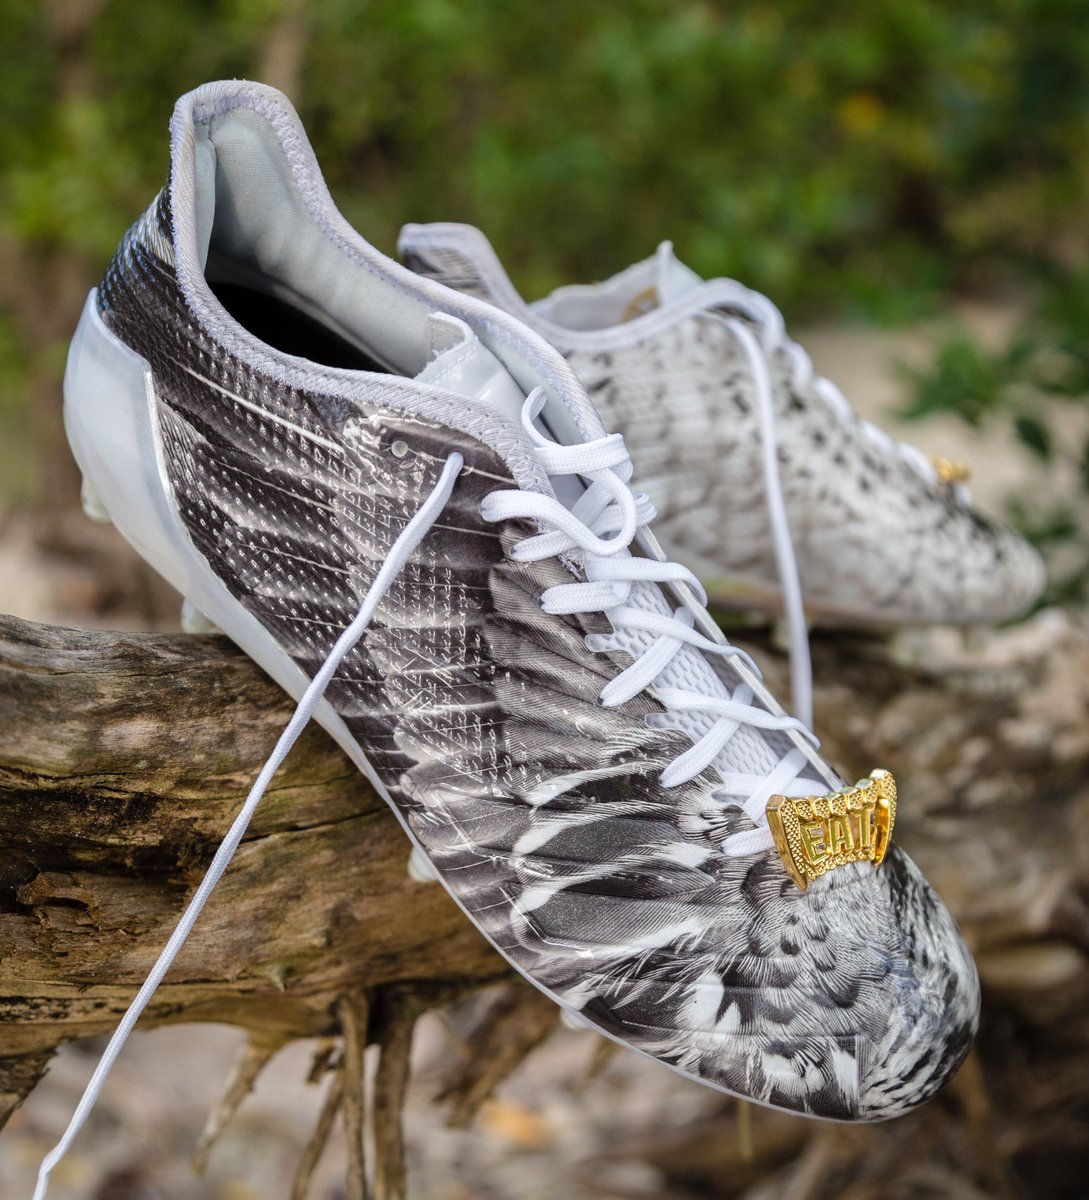 Adidas Adizero 5 Stelle 6,0 Uncaged